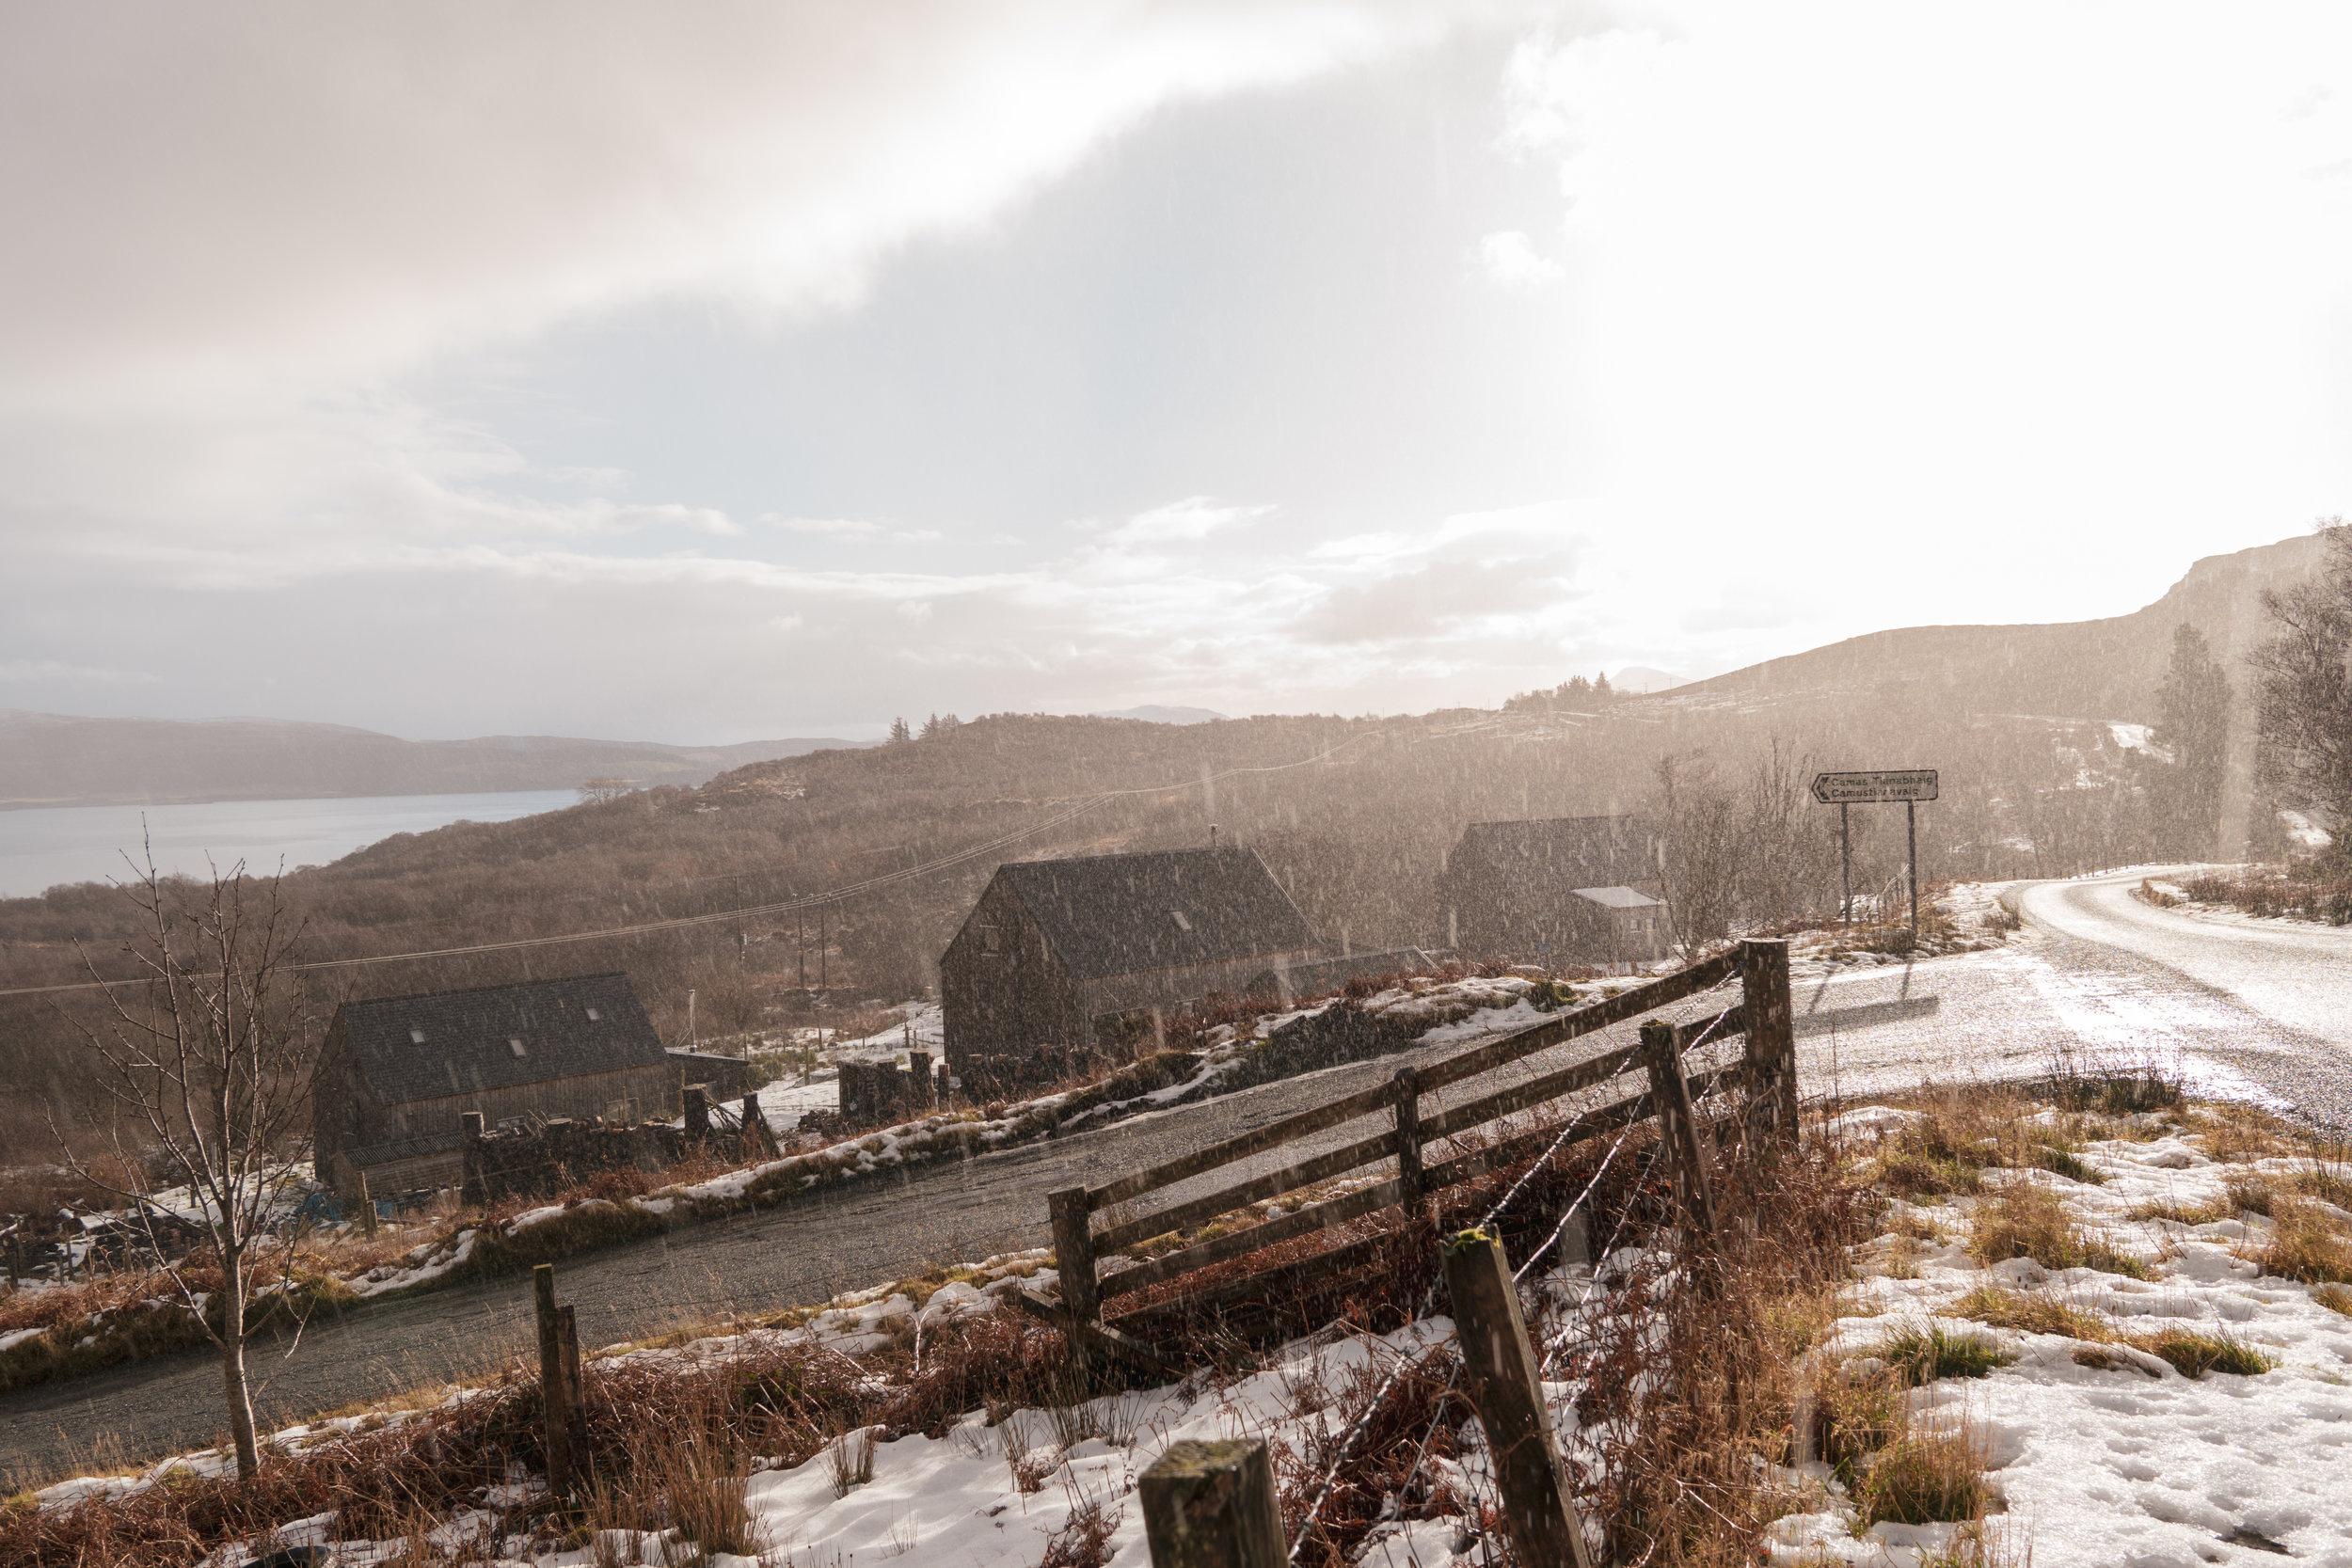 Isle-of-Skye-Fairy-Glen-und-Braes (3).jpg